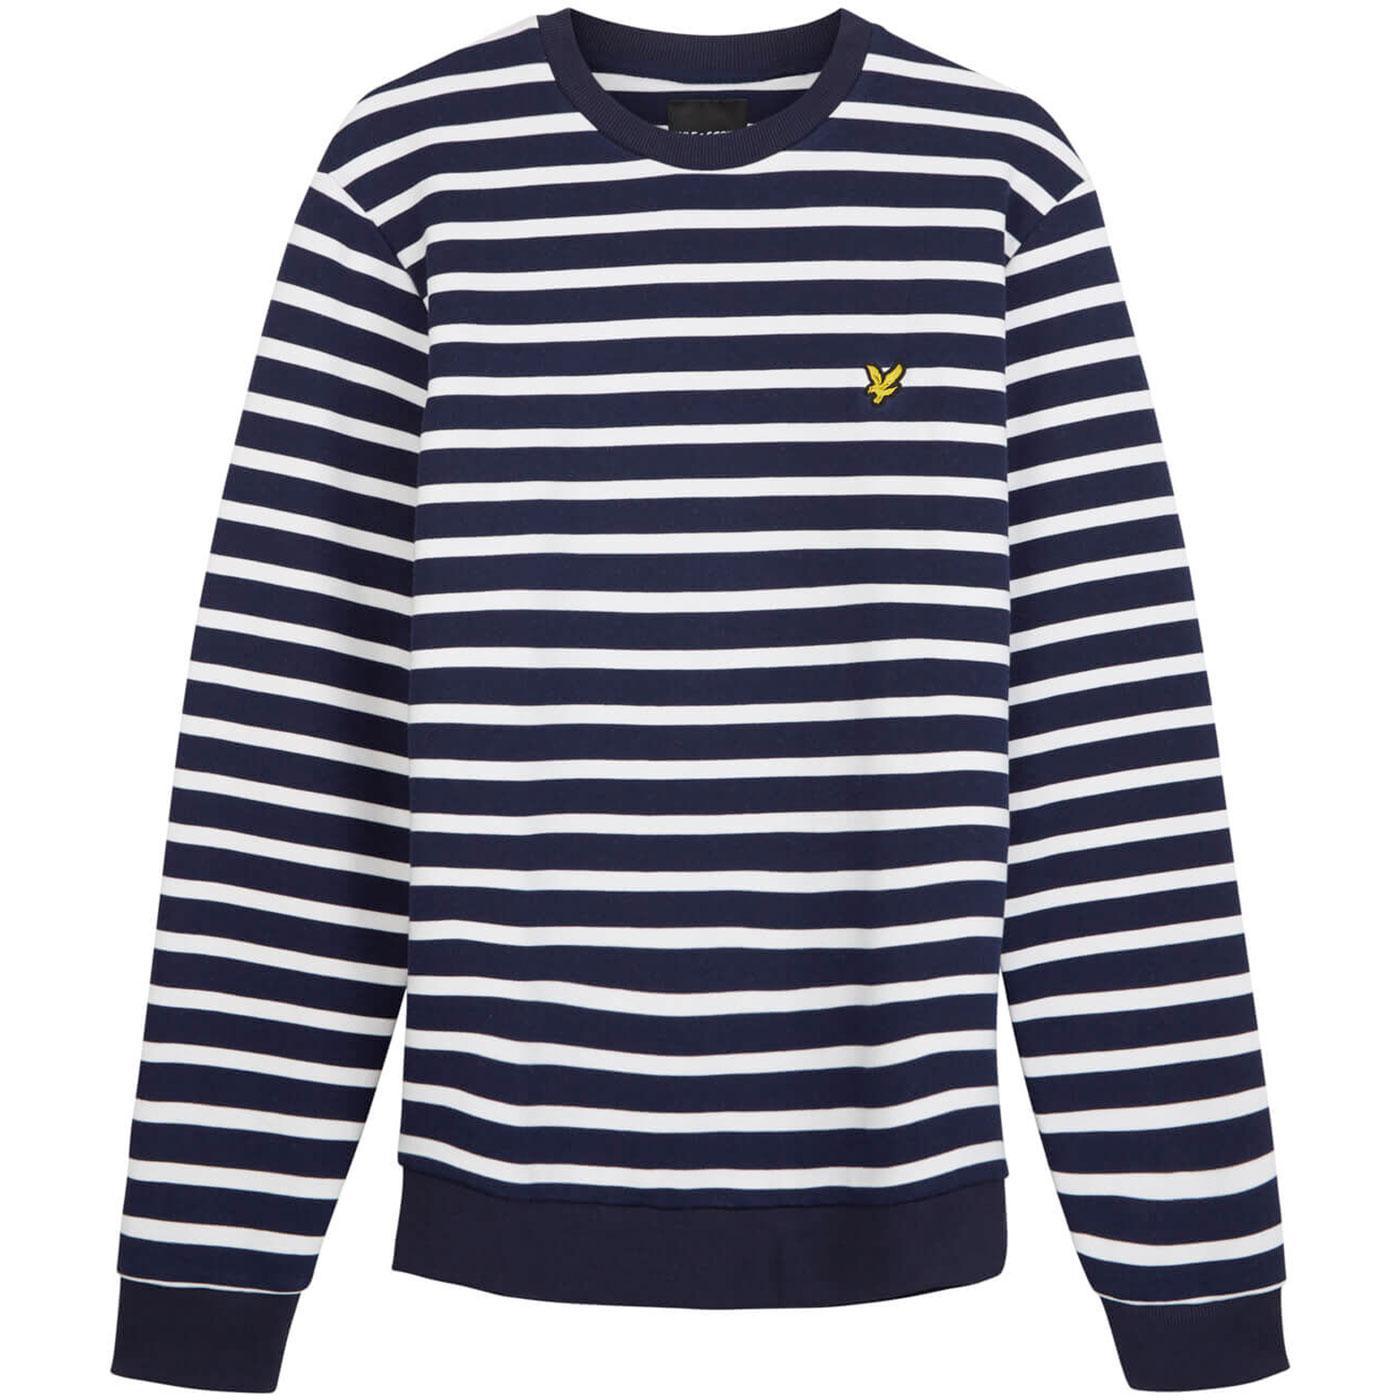 LYLE & SCOTT Men's Retro Breton Stripe Sweatshirt